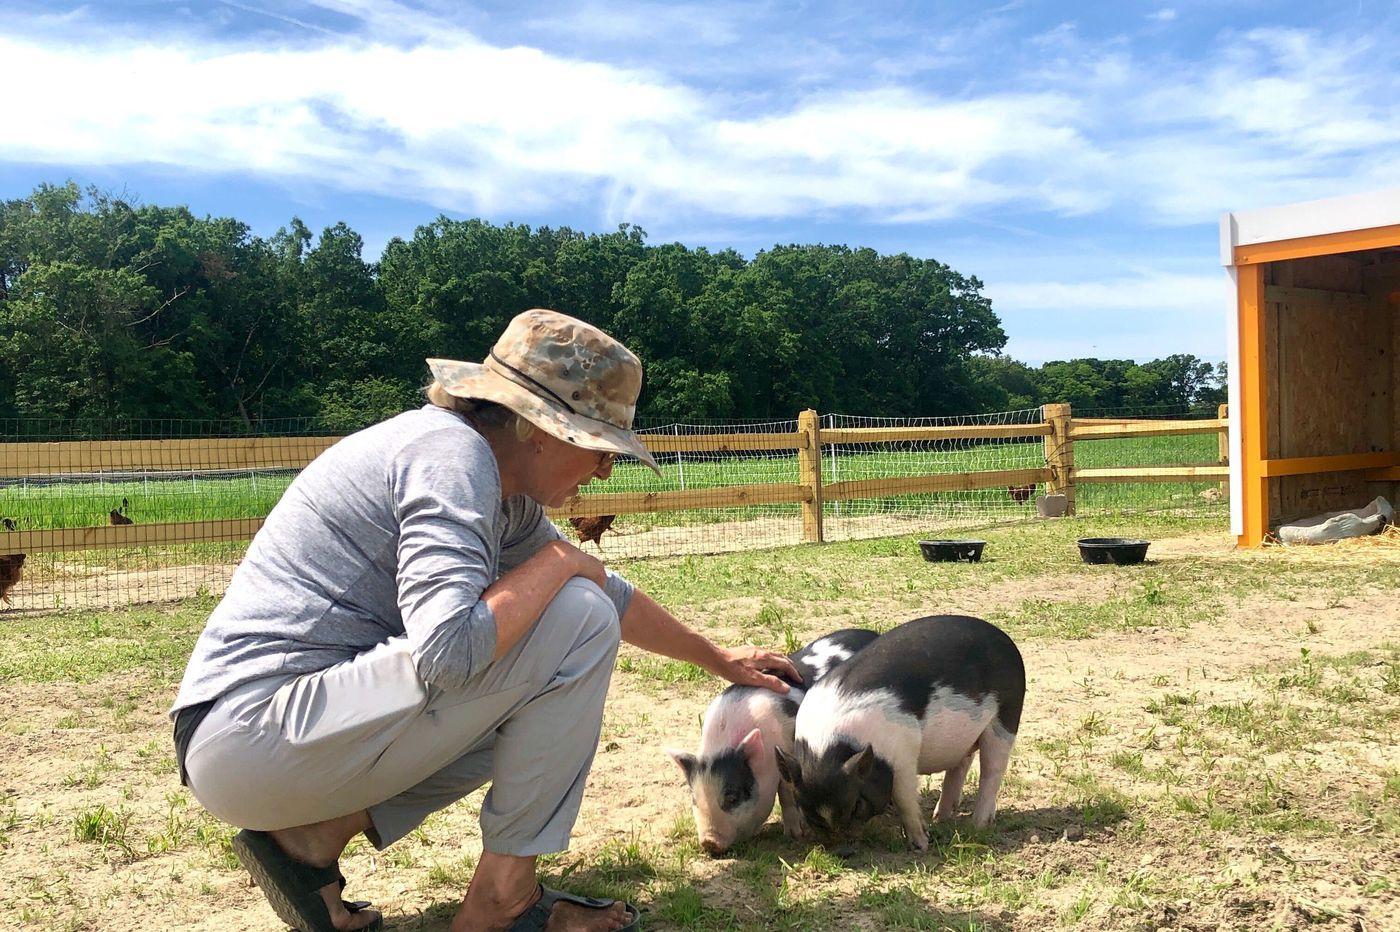 Jersey Shore restaurateur Cookie Till launches a farm and animal sanctuary